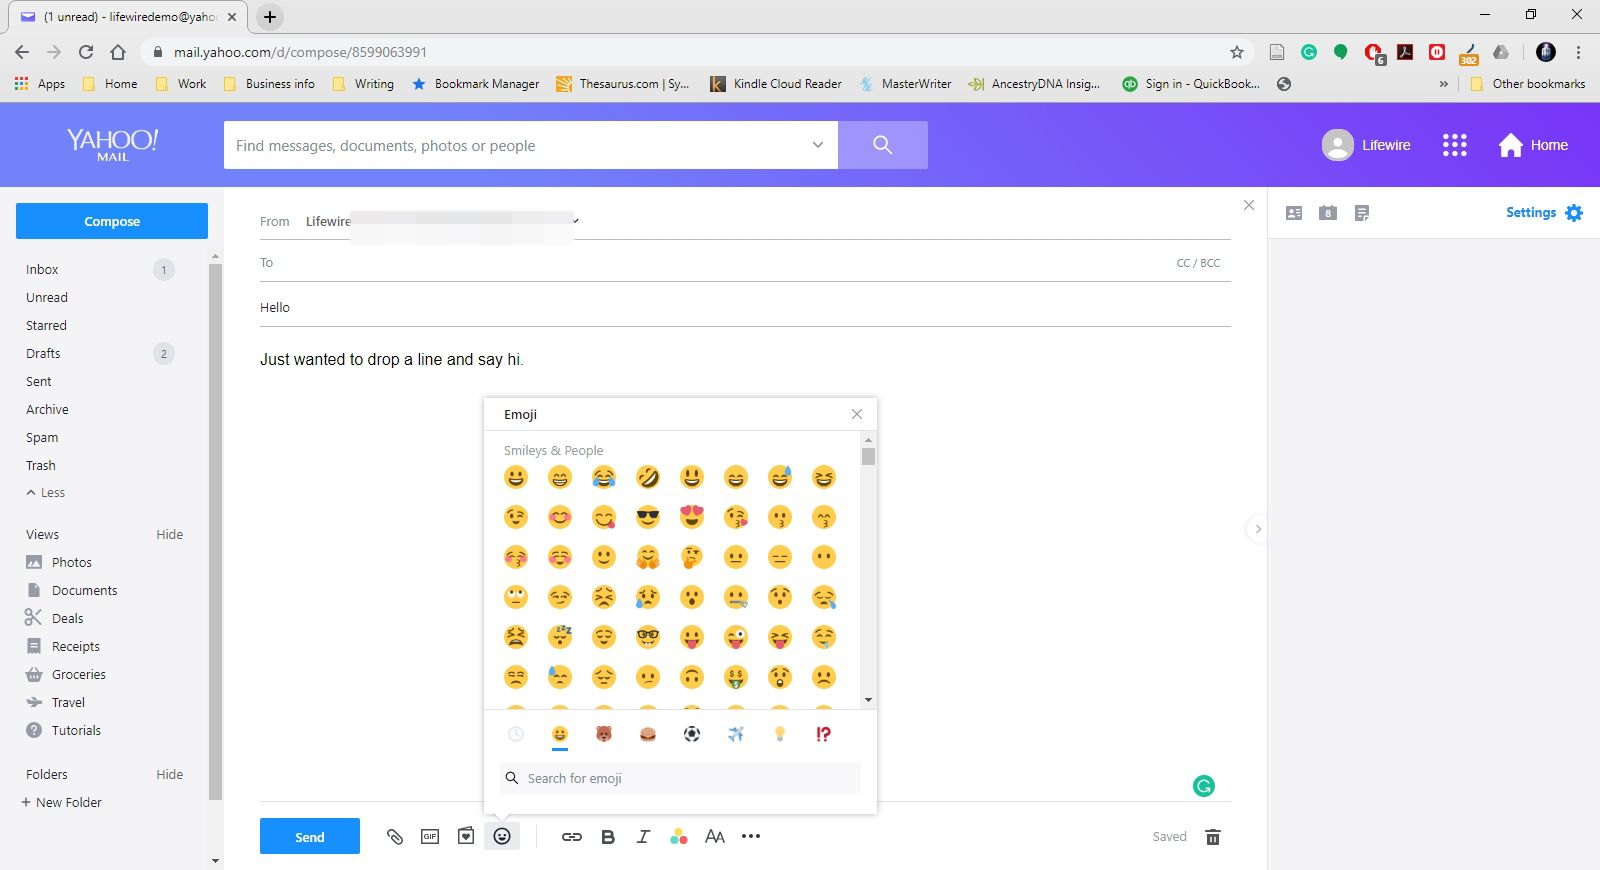 The insert emojis menu in Yahoo Mail.